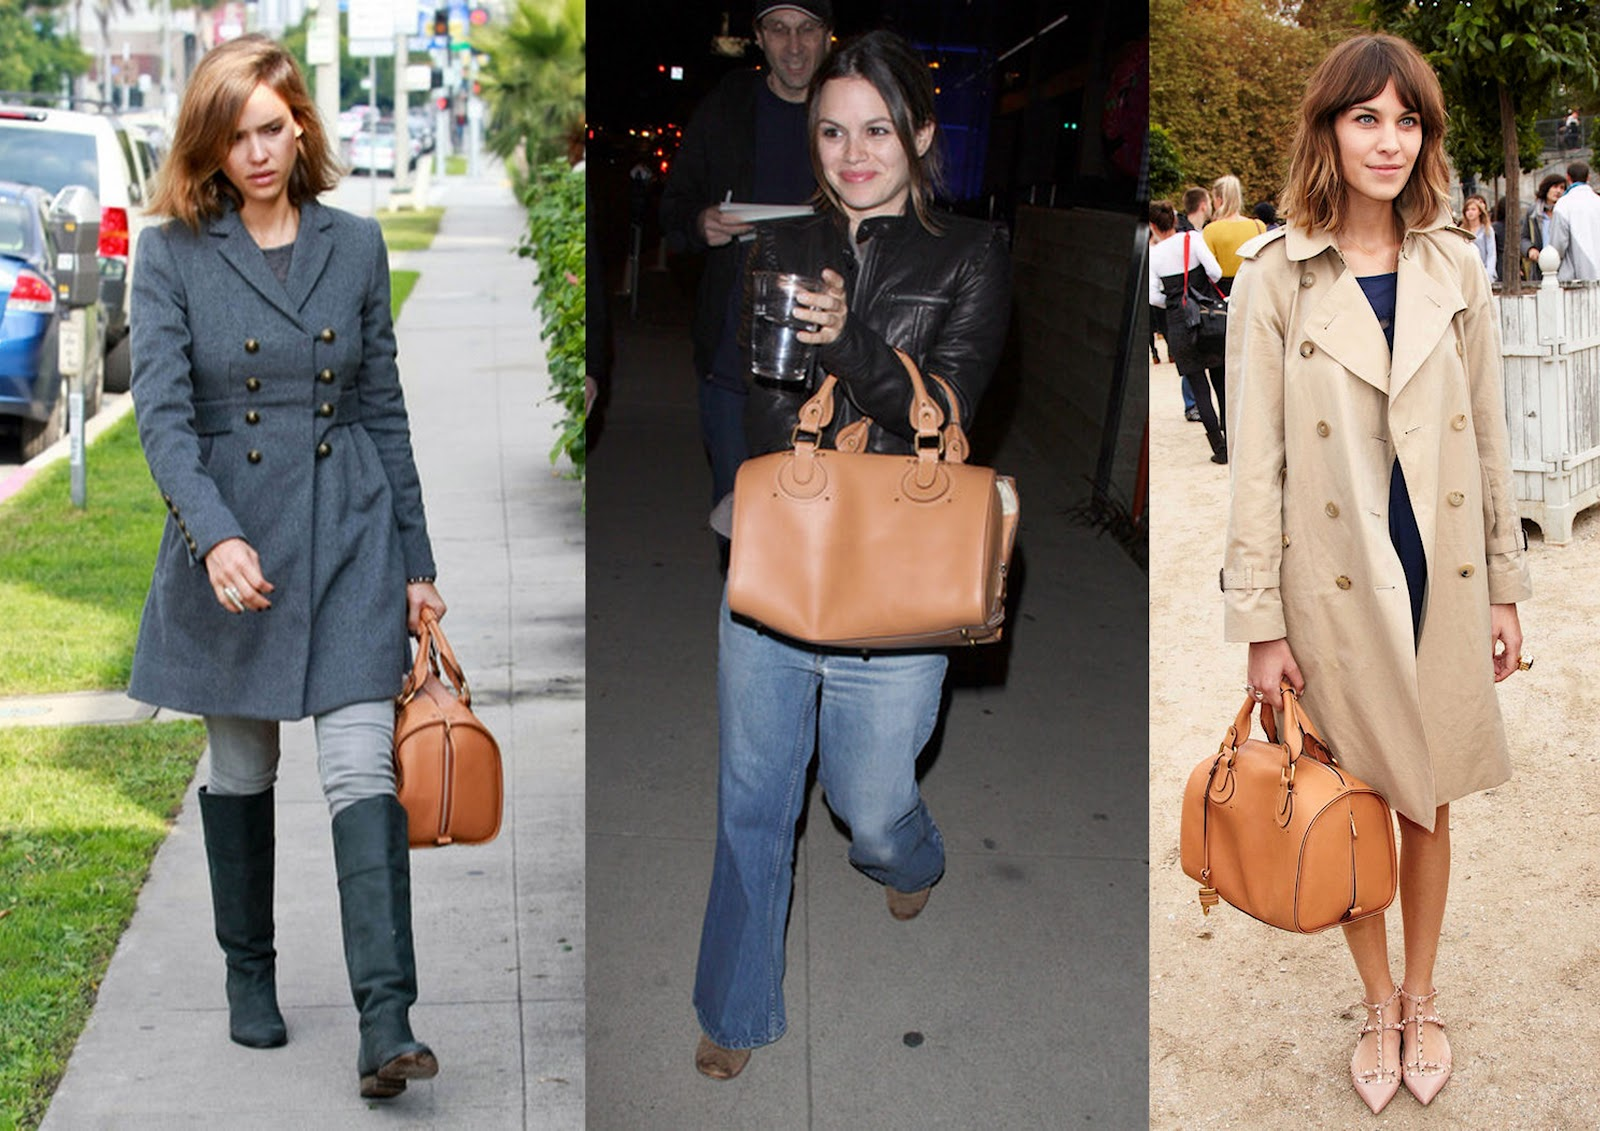 Vogue and Cigarettes: The \u0026quot;it\u0026quot; bag of the moment - Chlo¨¦\u0026#39;s Aurore